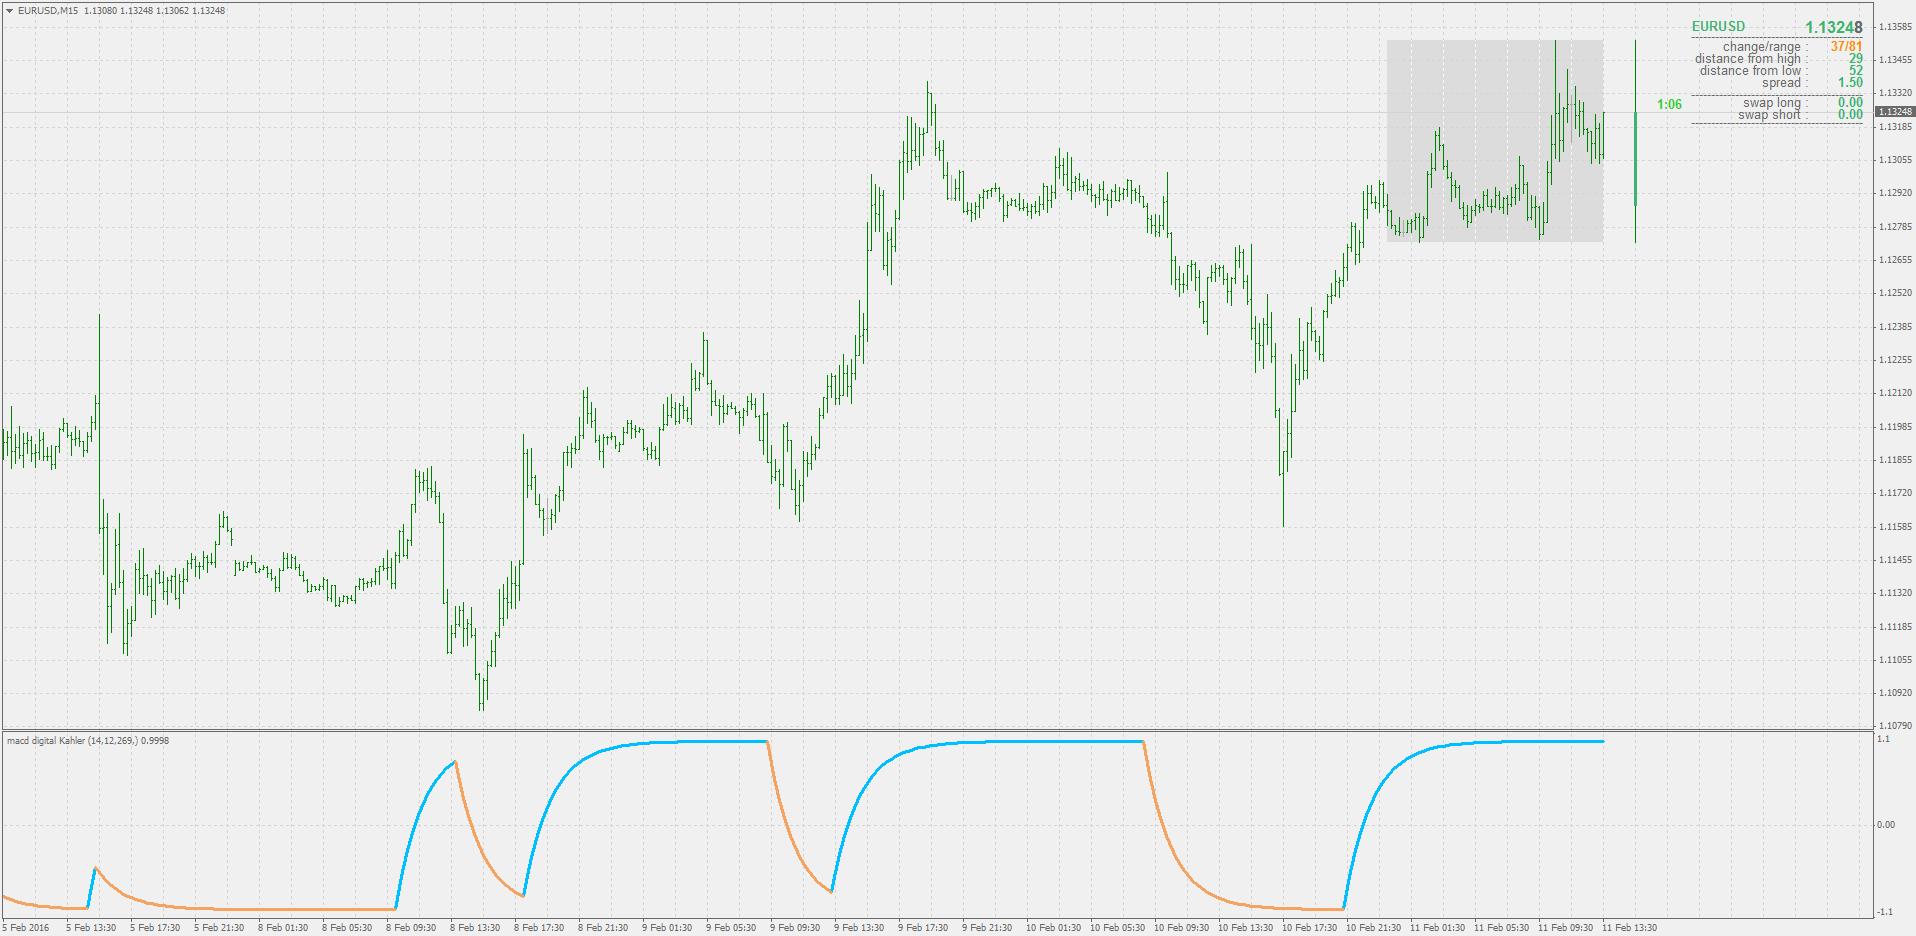 Rsi indicator forex-tsd